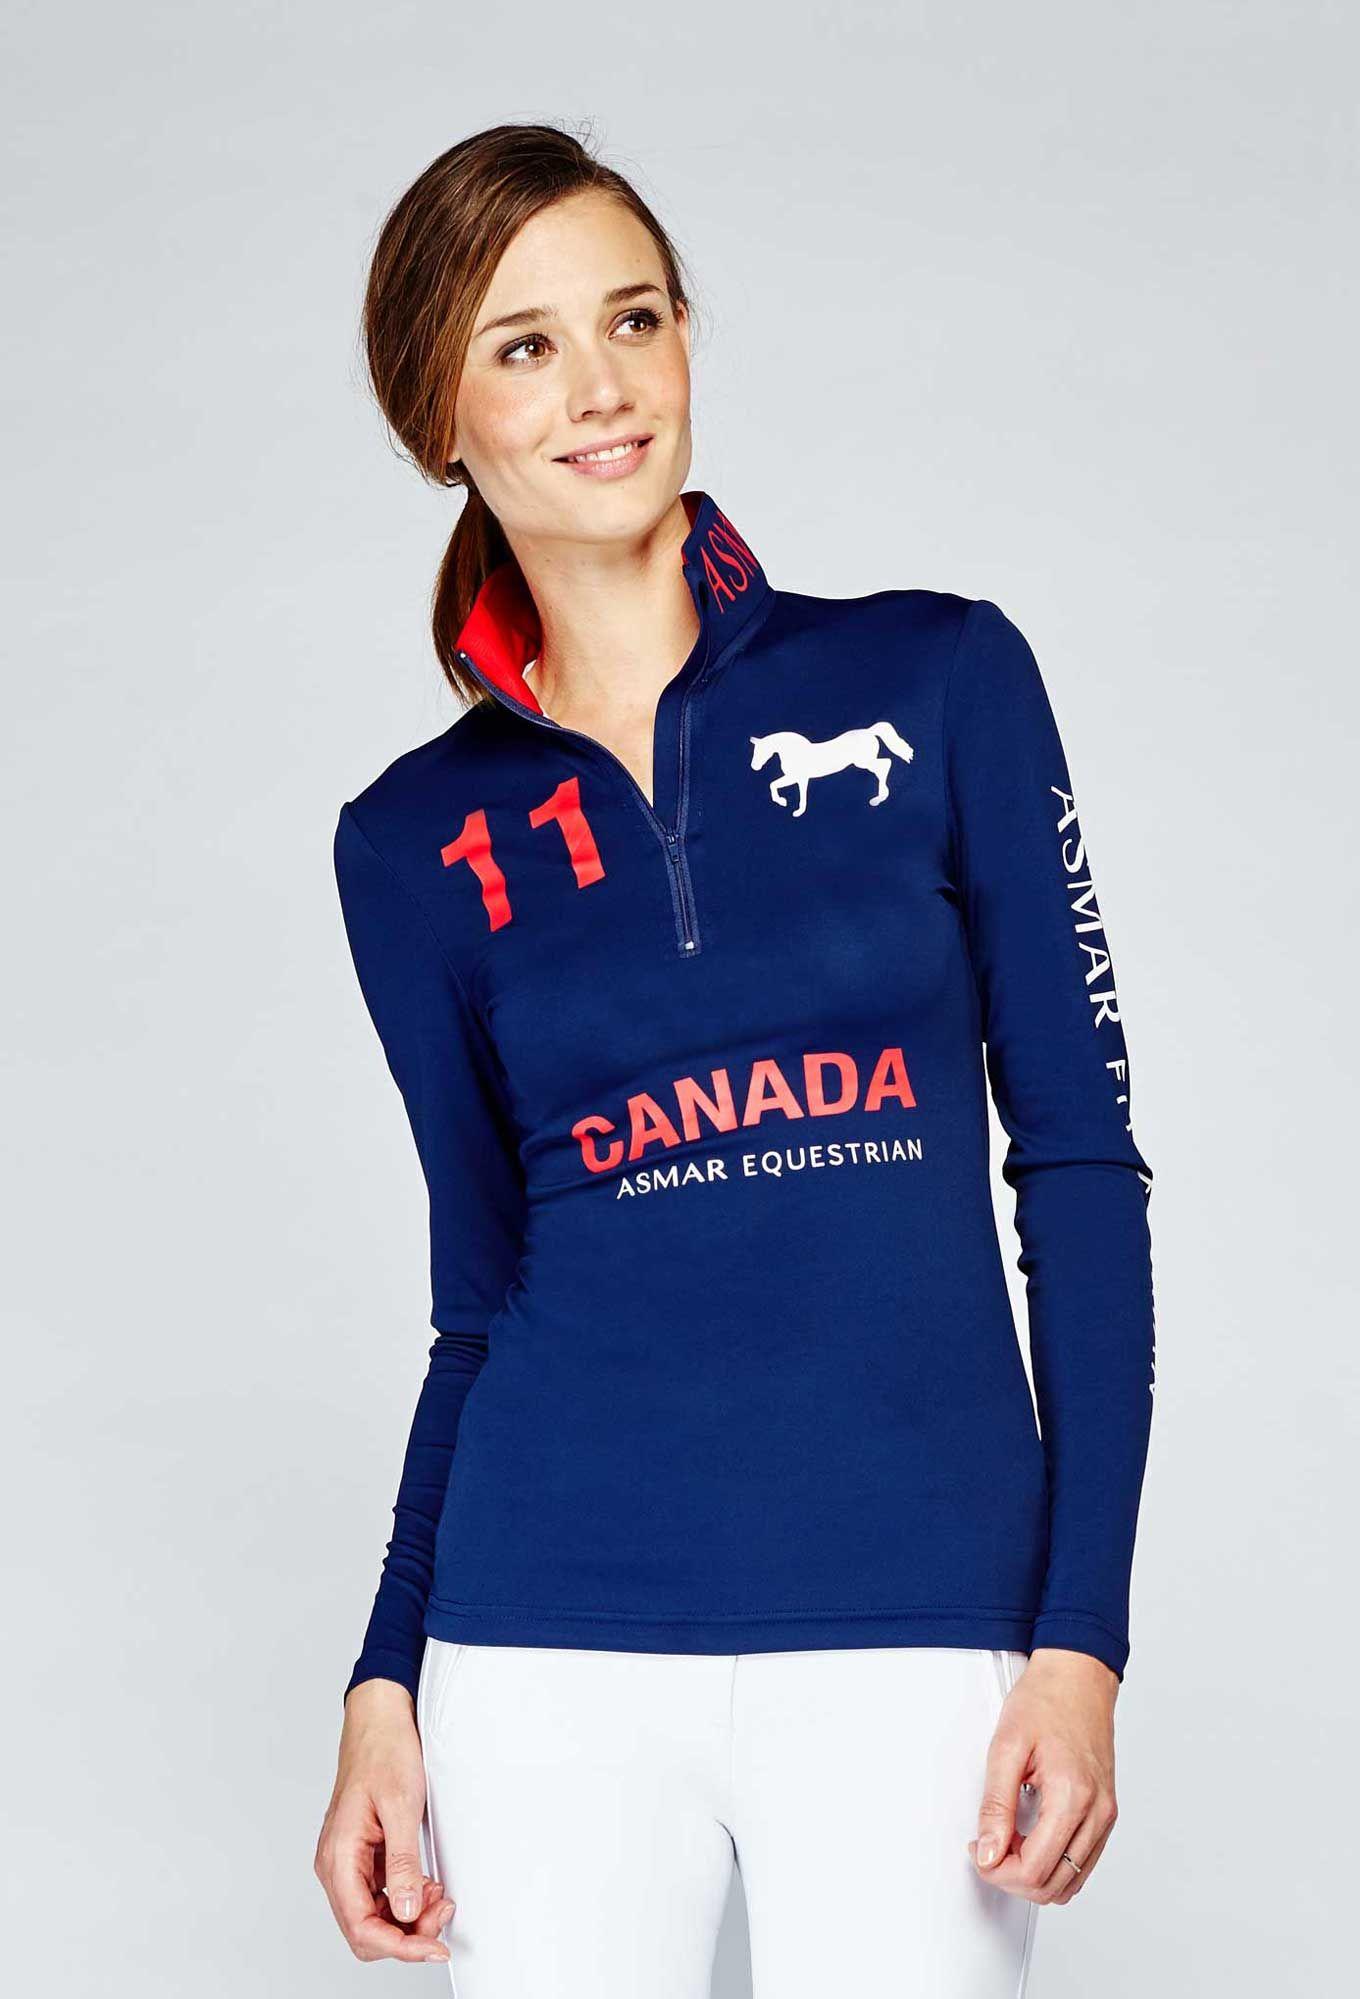 Equestrian Sun Shirts Canada Chad Crowley Productions